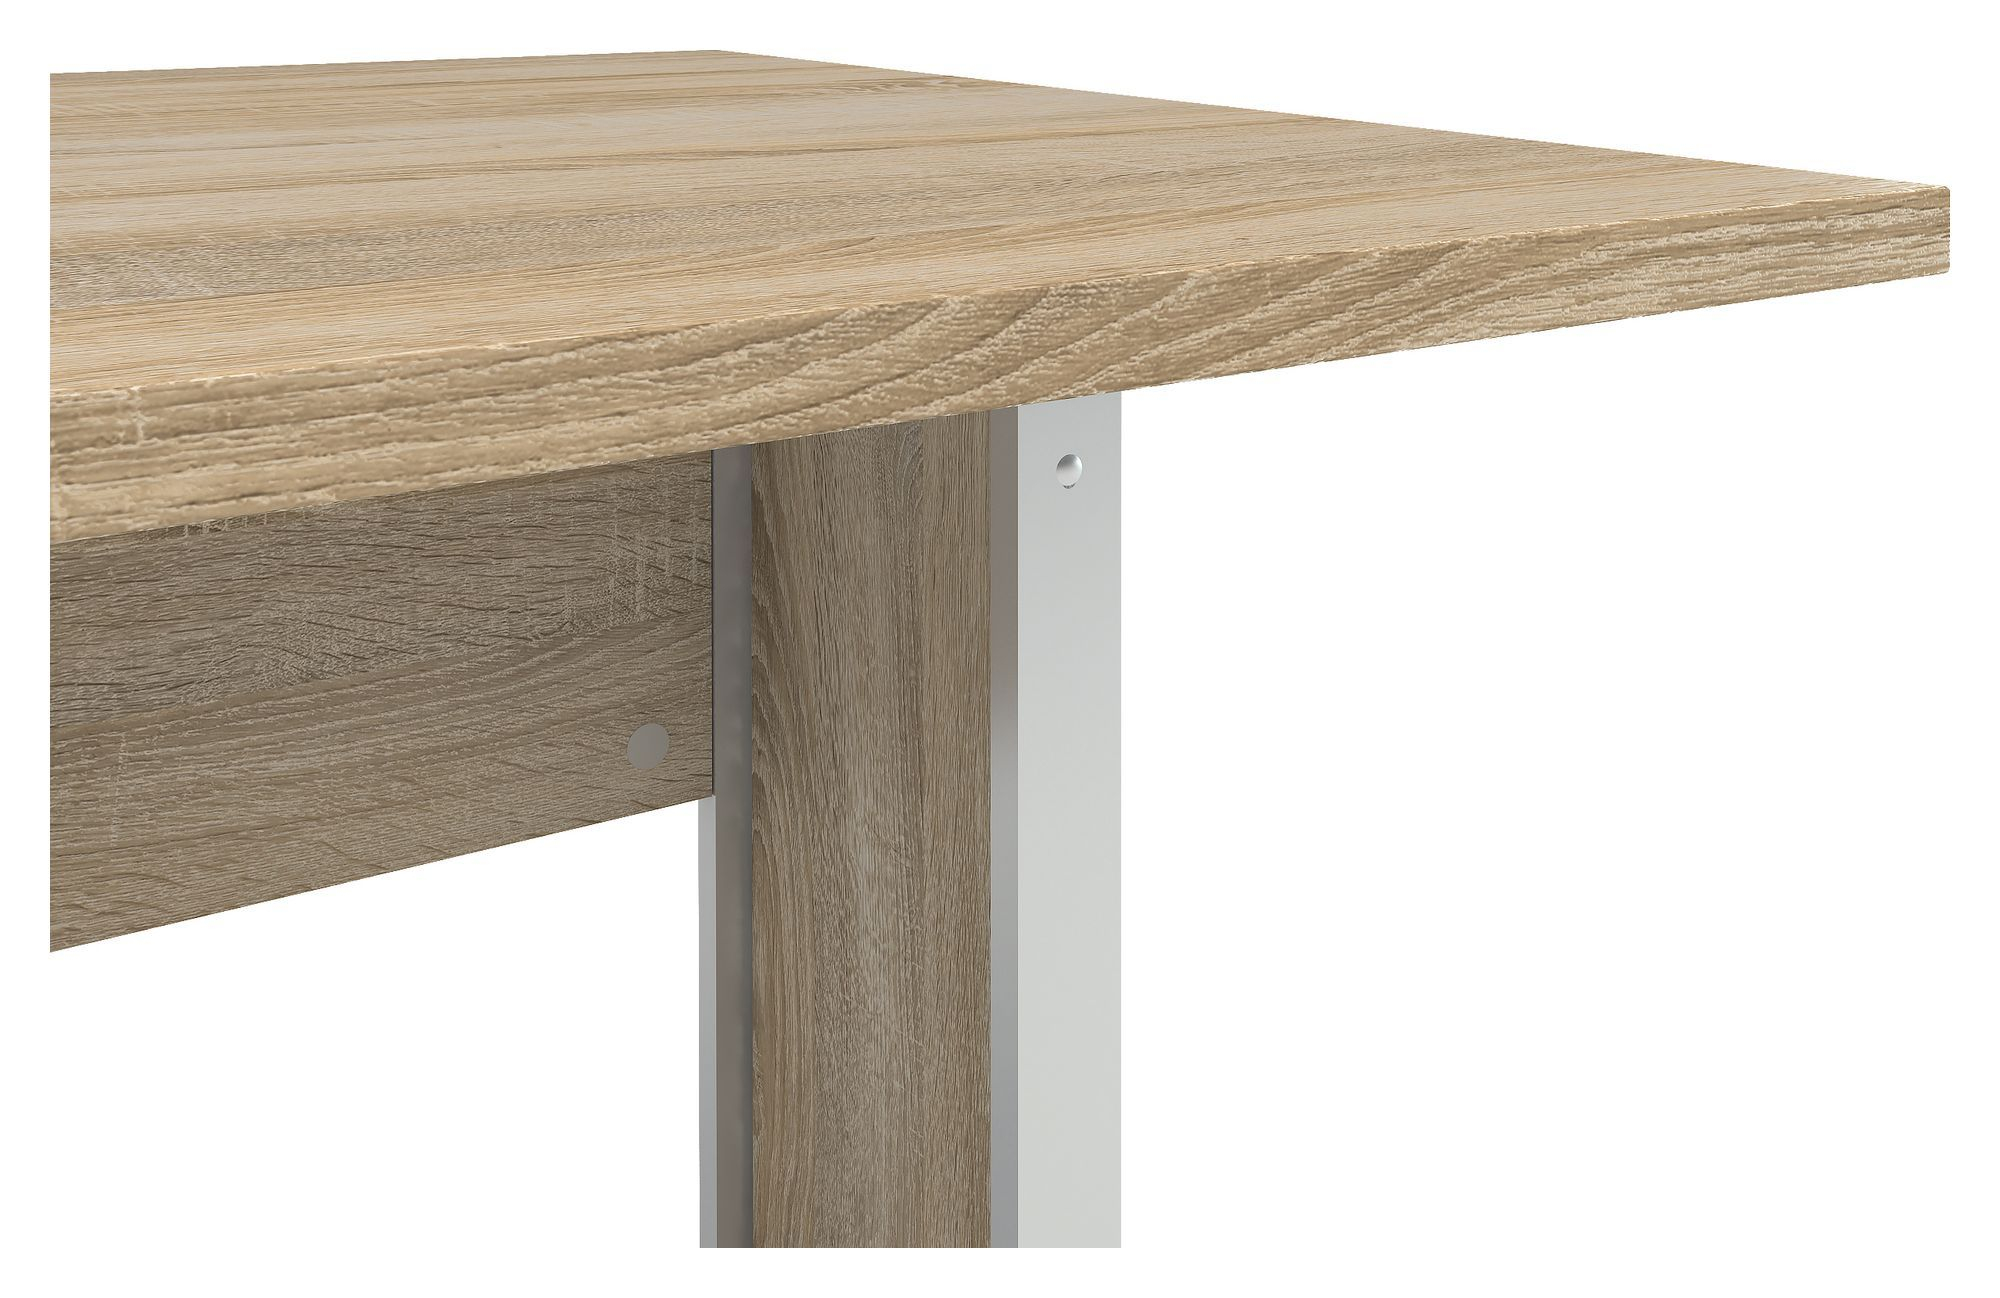 Prima Skrivebord - Lys træ 120cm m/metalben - Skrivebord med egetræs-look